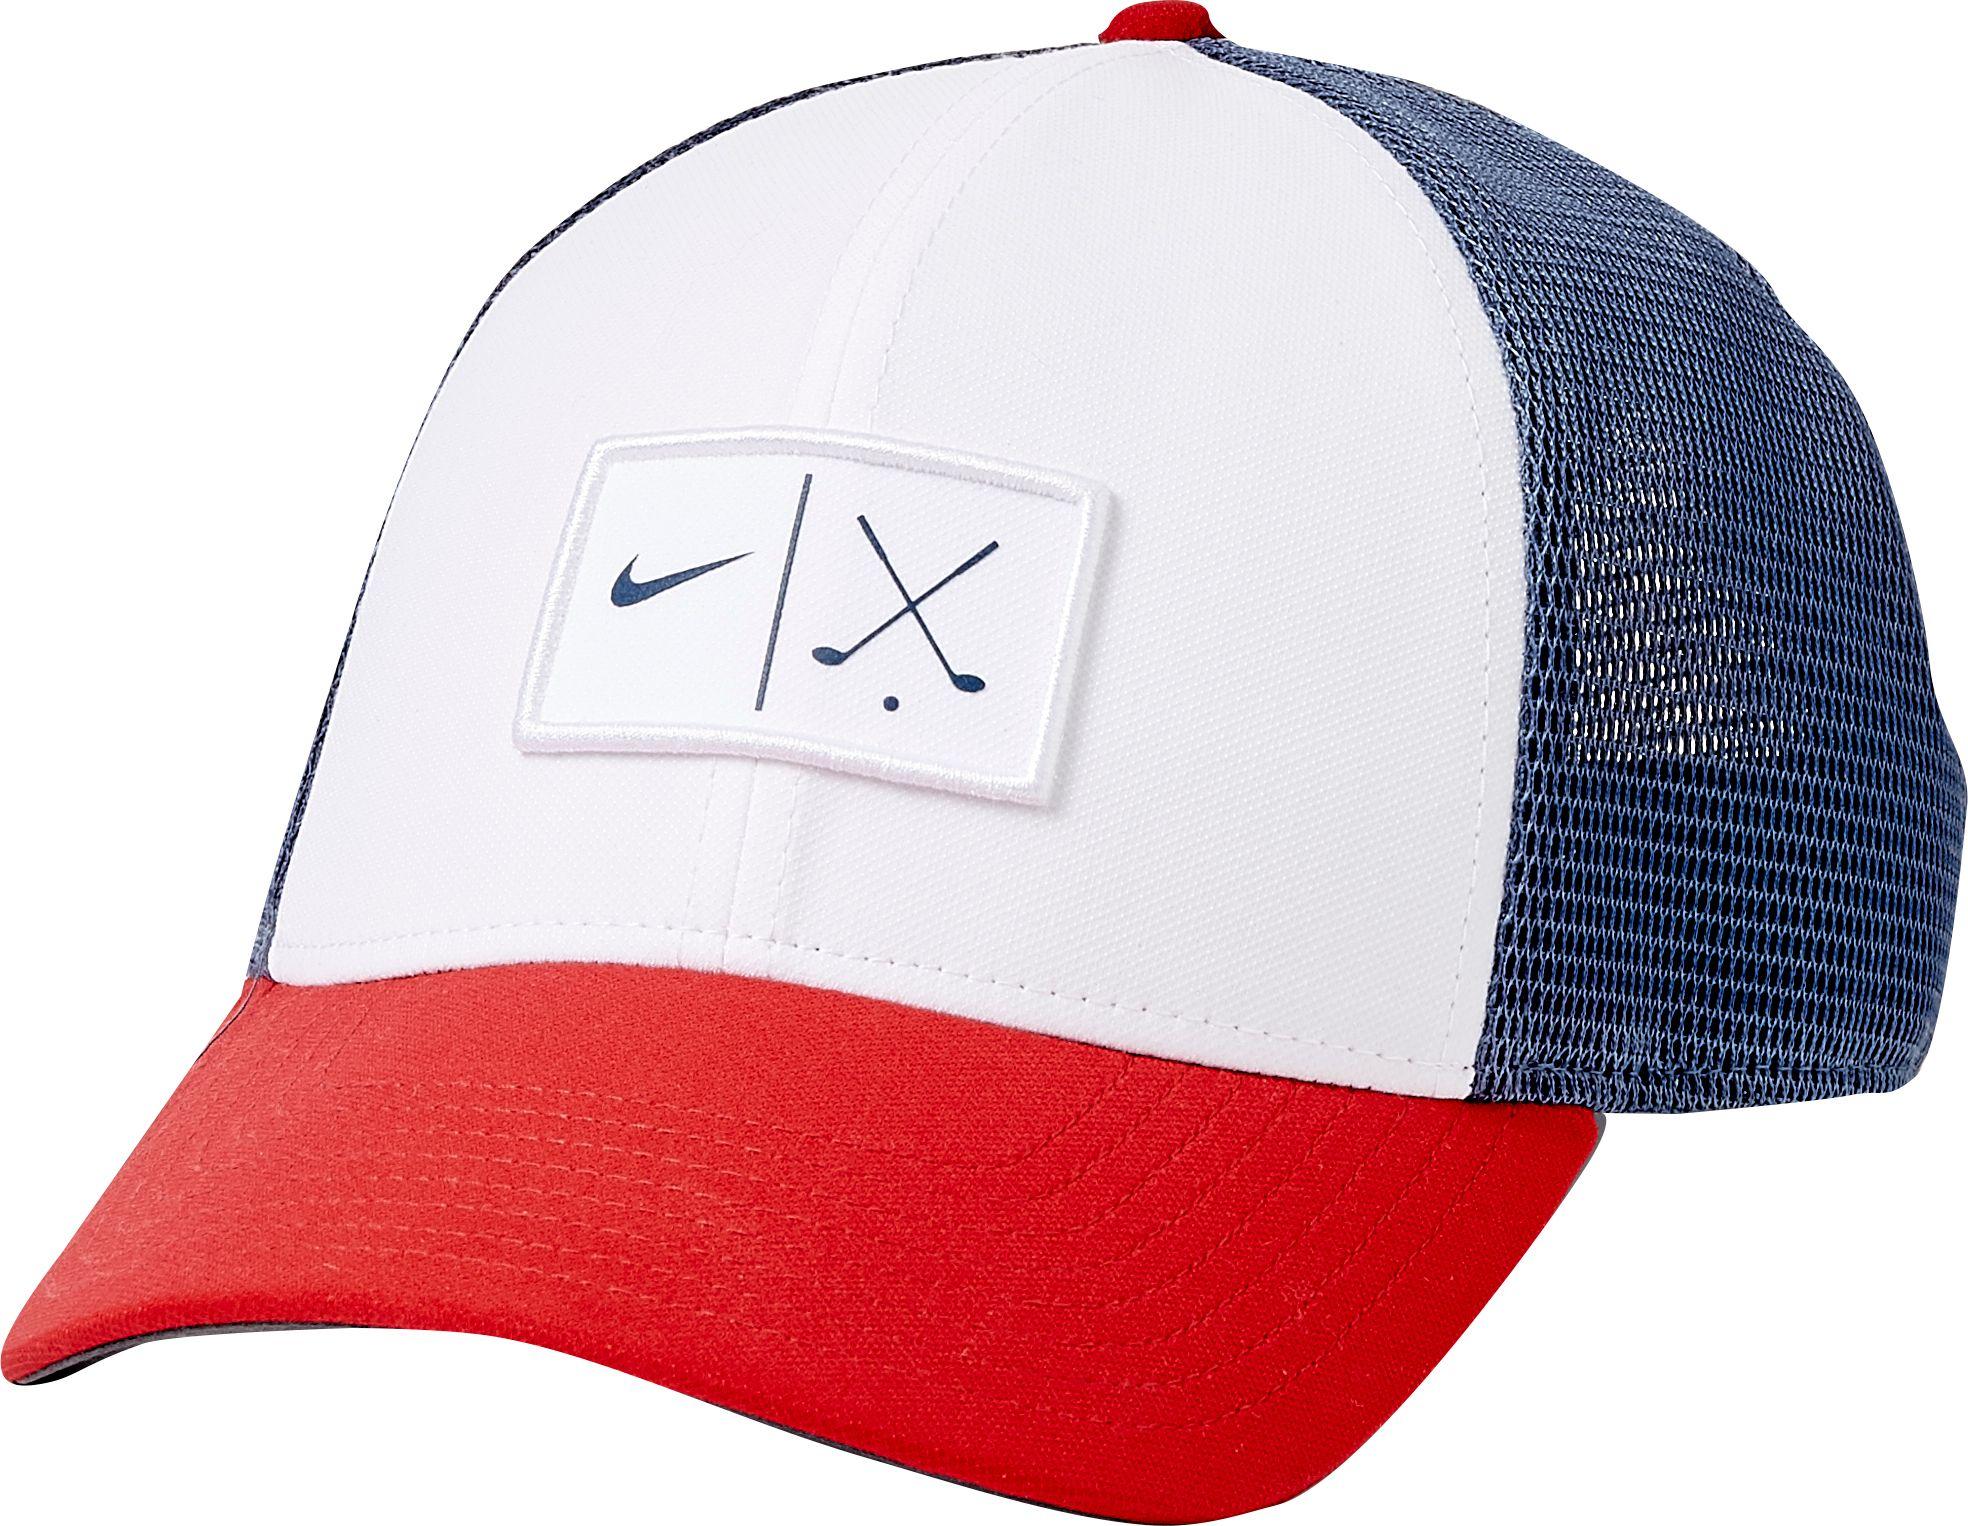 178c4fde4 Nike Men's Mesh Golf Hat | DICK'S Sporting GoodsProposition 65 ...